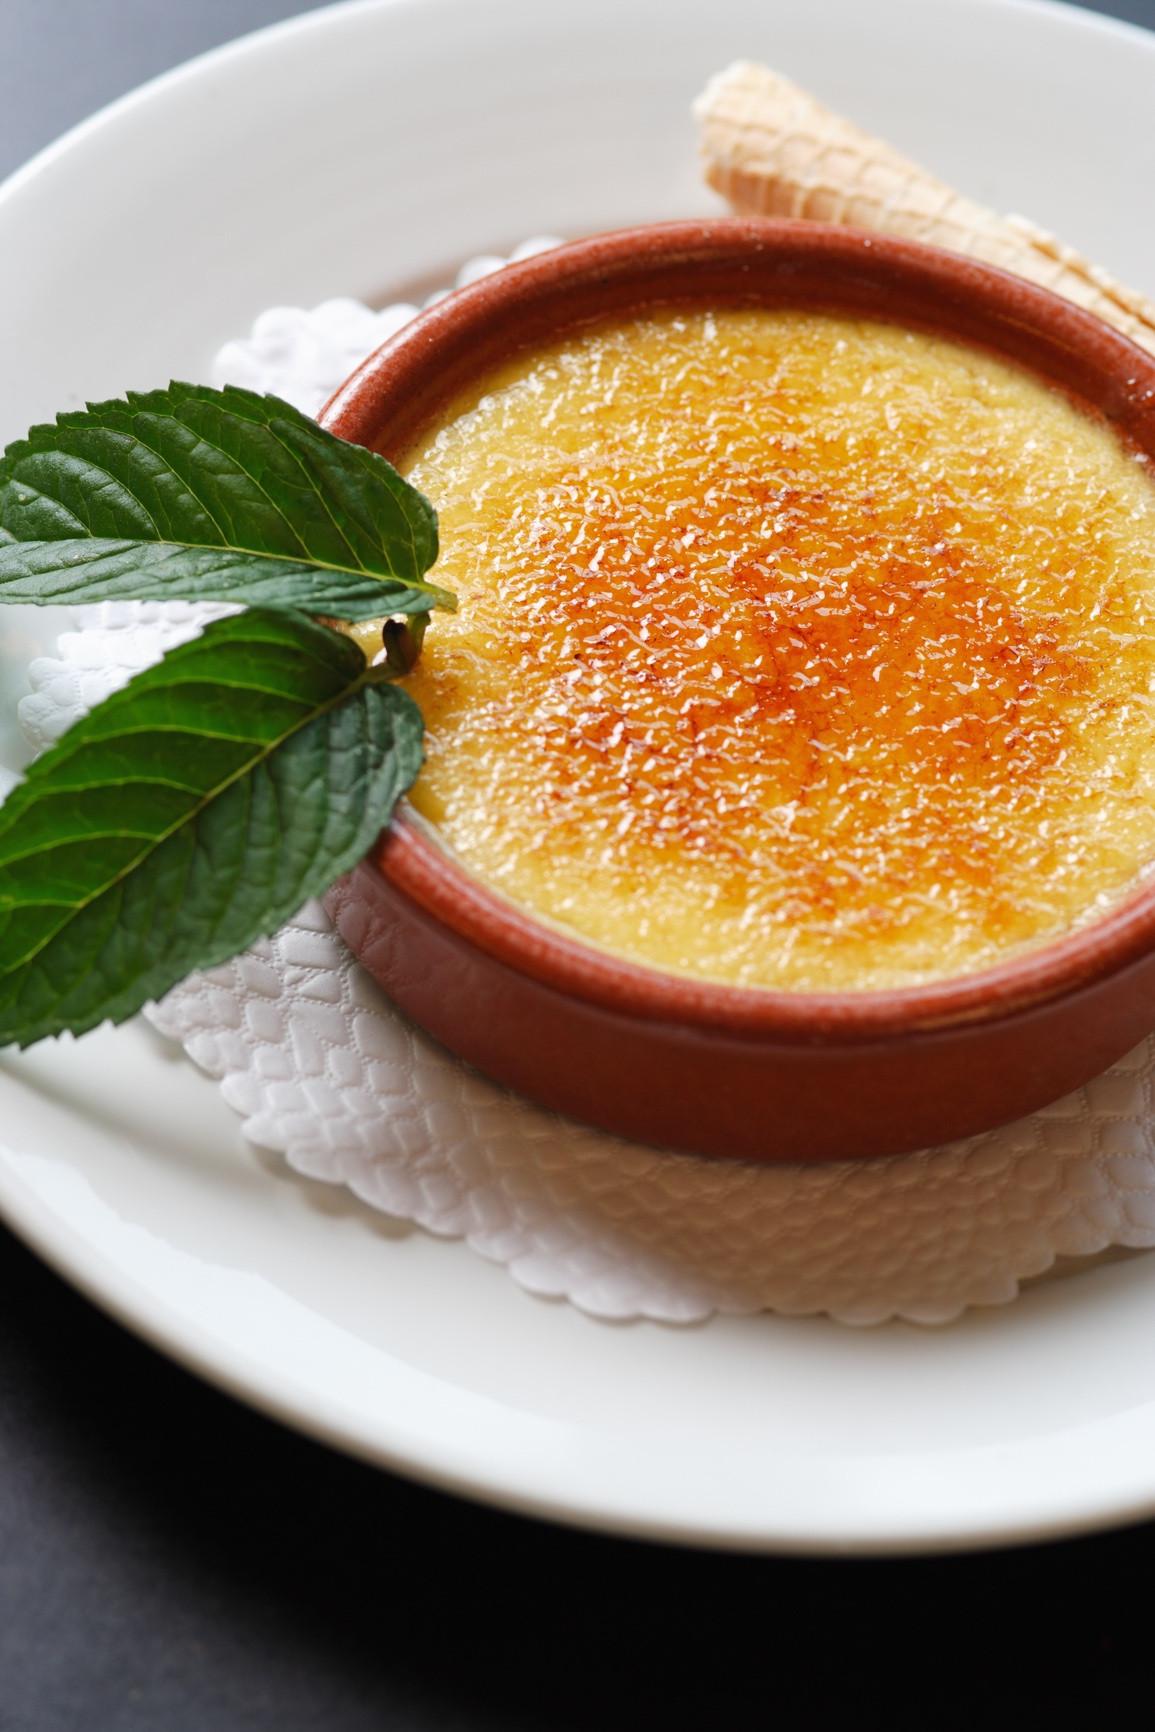 Easy Spanish Dessert Recipes  Spanish Dessert Recipes from Spanish Food World